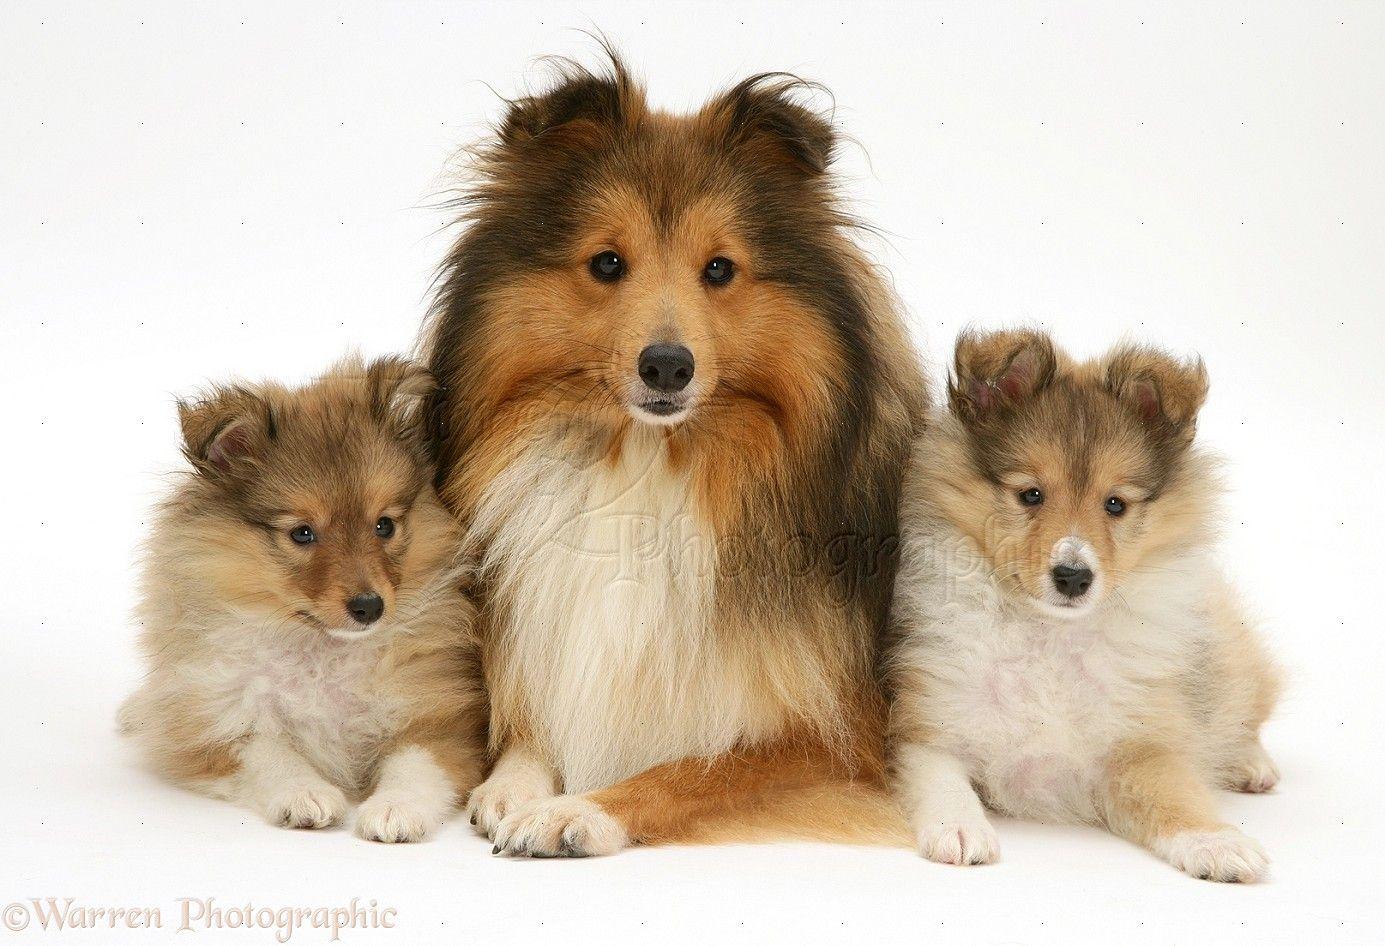 Simple Icelandic Sheepdog Canine Adorable Dog - 32b388ed25d2a97af28fb6ab23541001  Trends_167114  .jpg